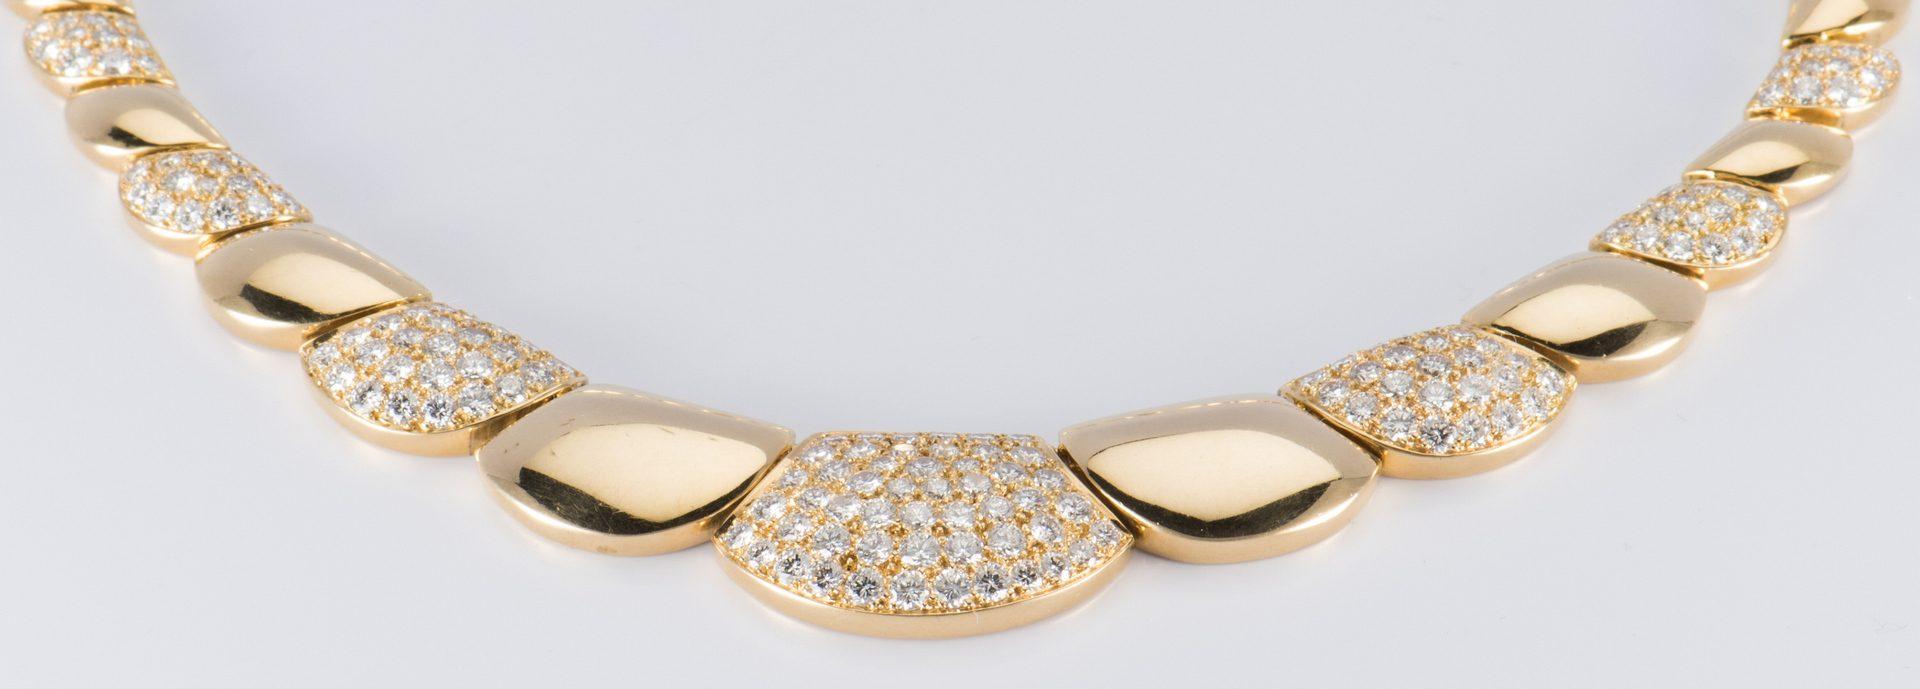 "Lot 54: 18K Diamond Disc Necklace, 17"" L"